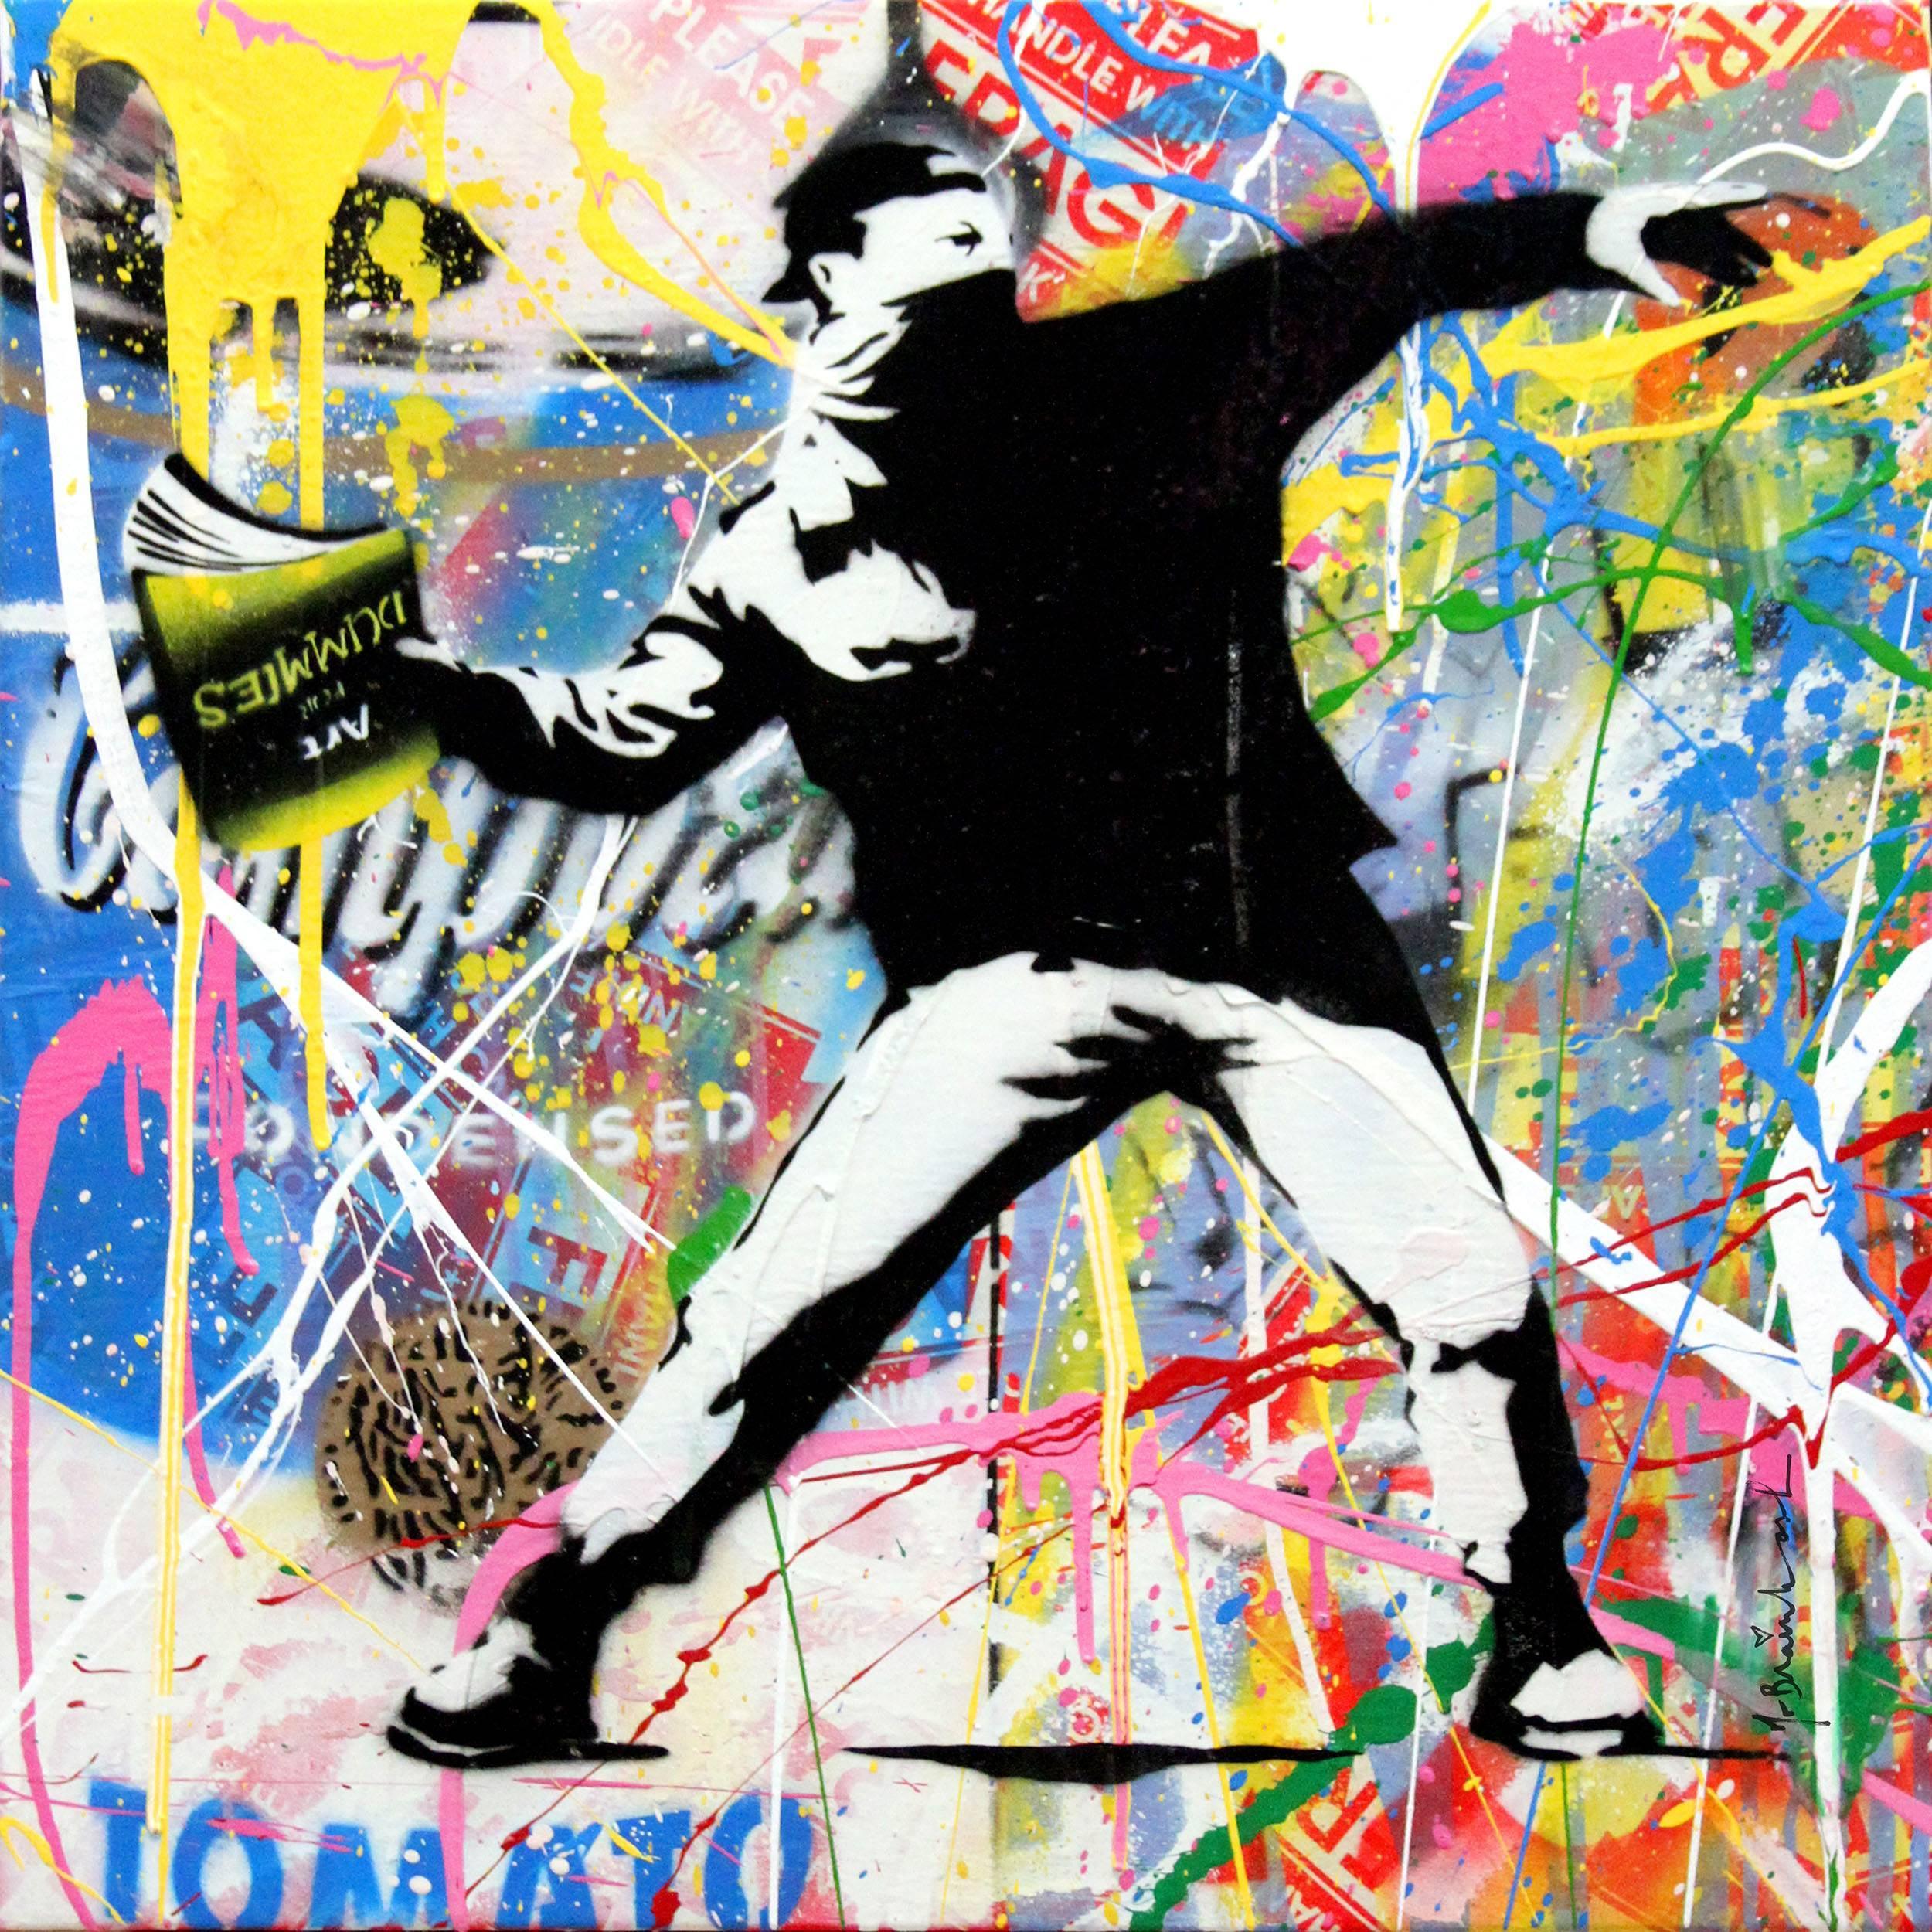 Banksy Thrower (9) by Mr. Brainwash